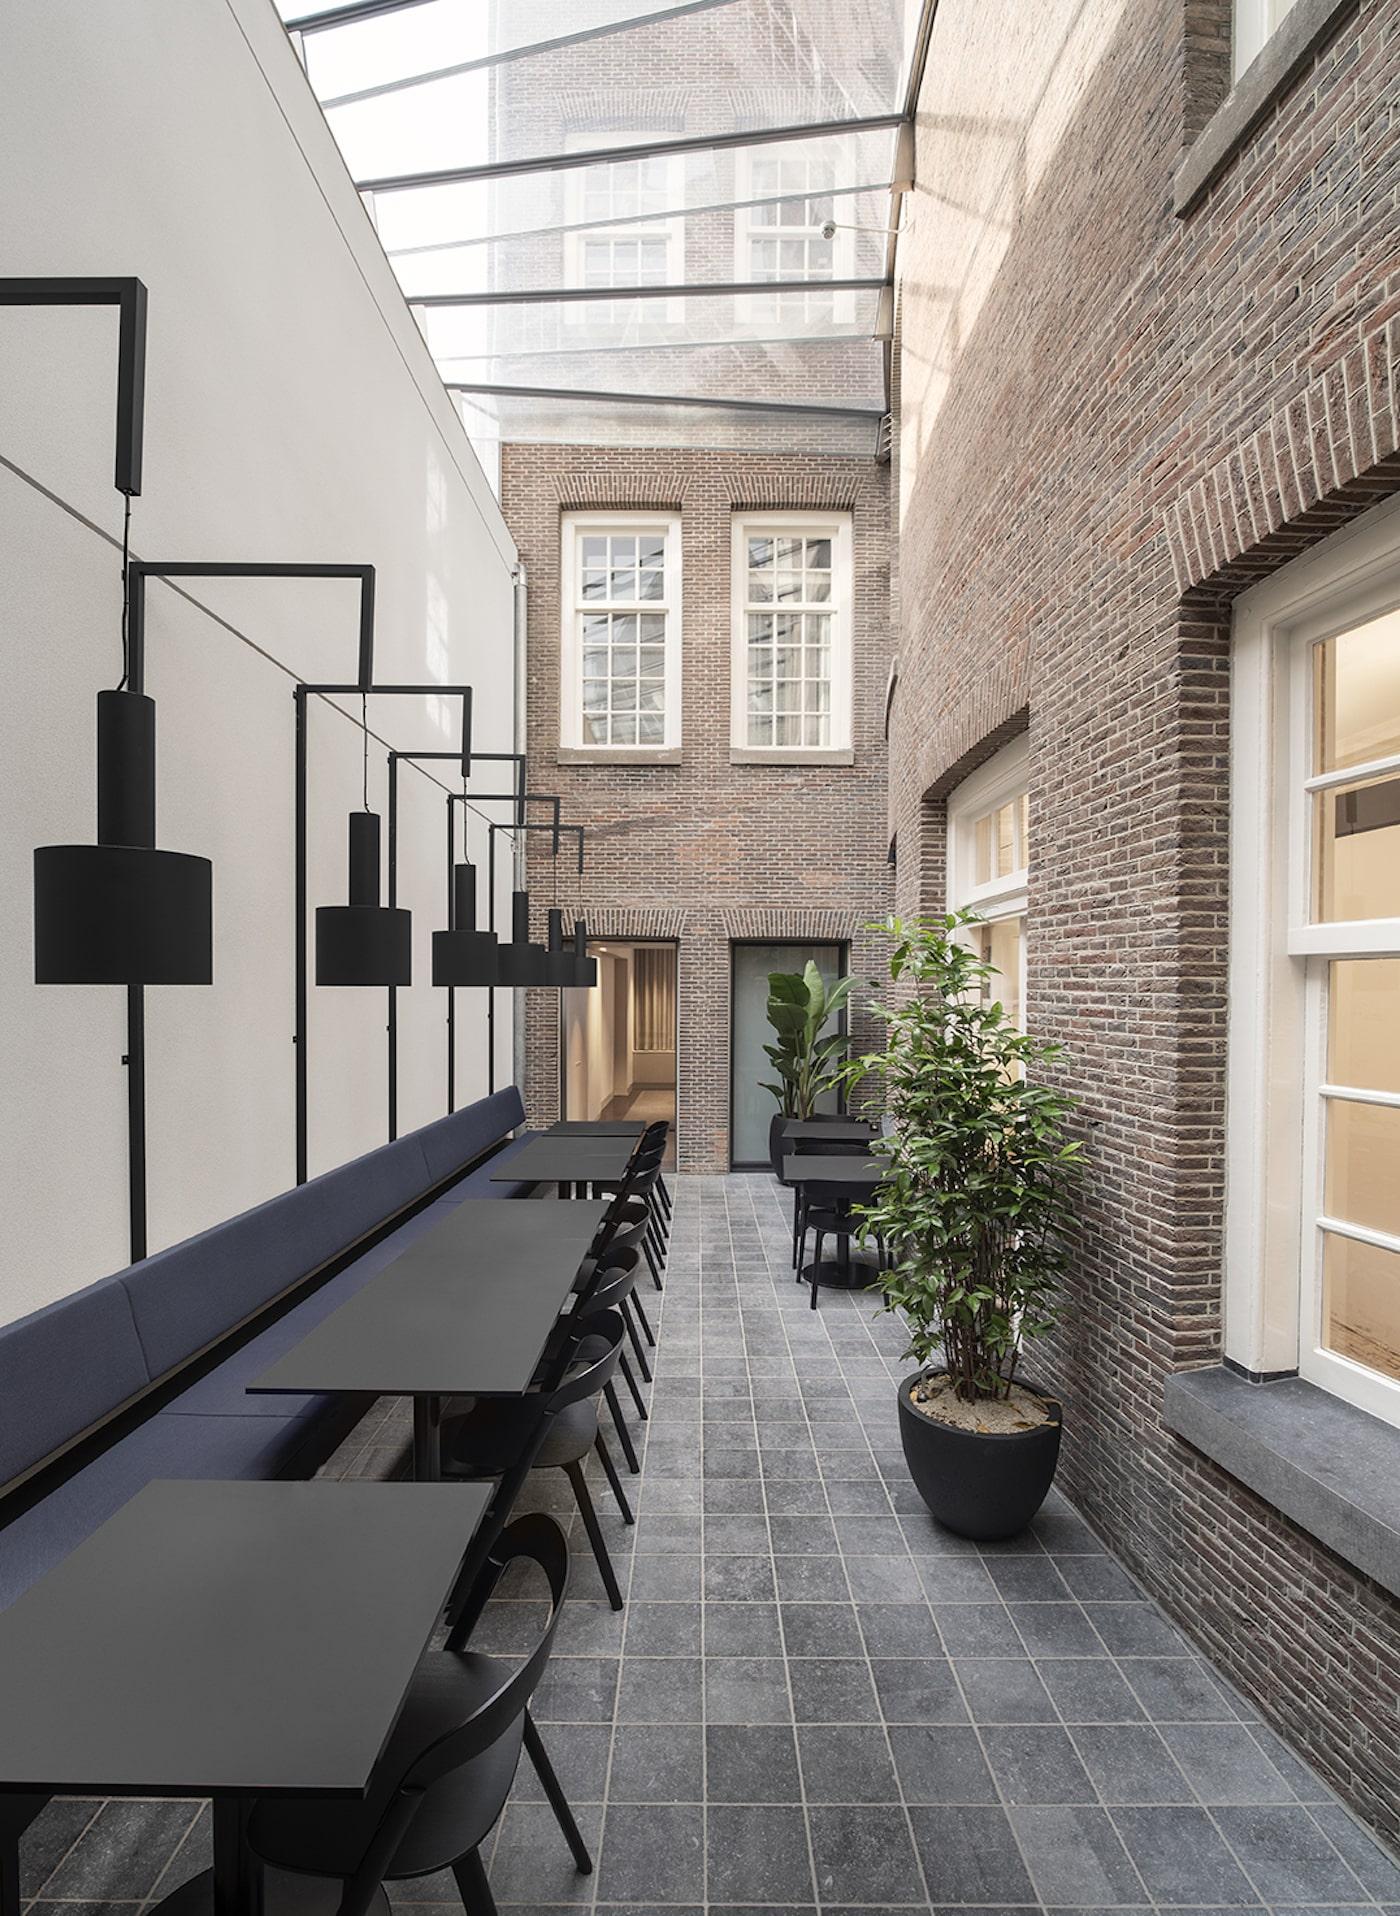 Felix Meritis courtyard with glass roof